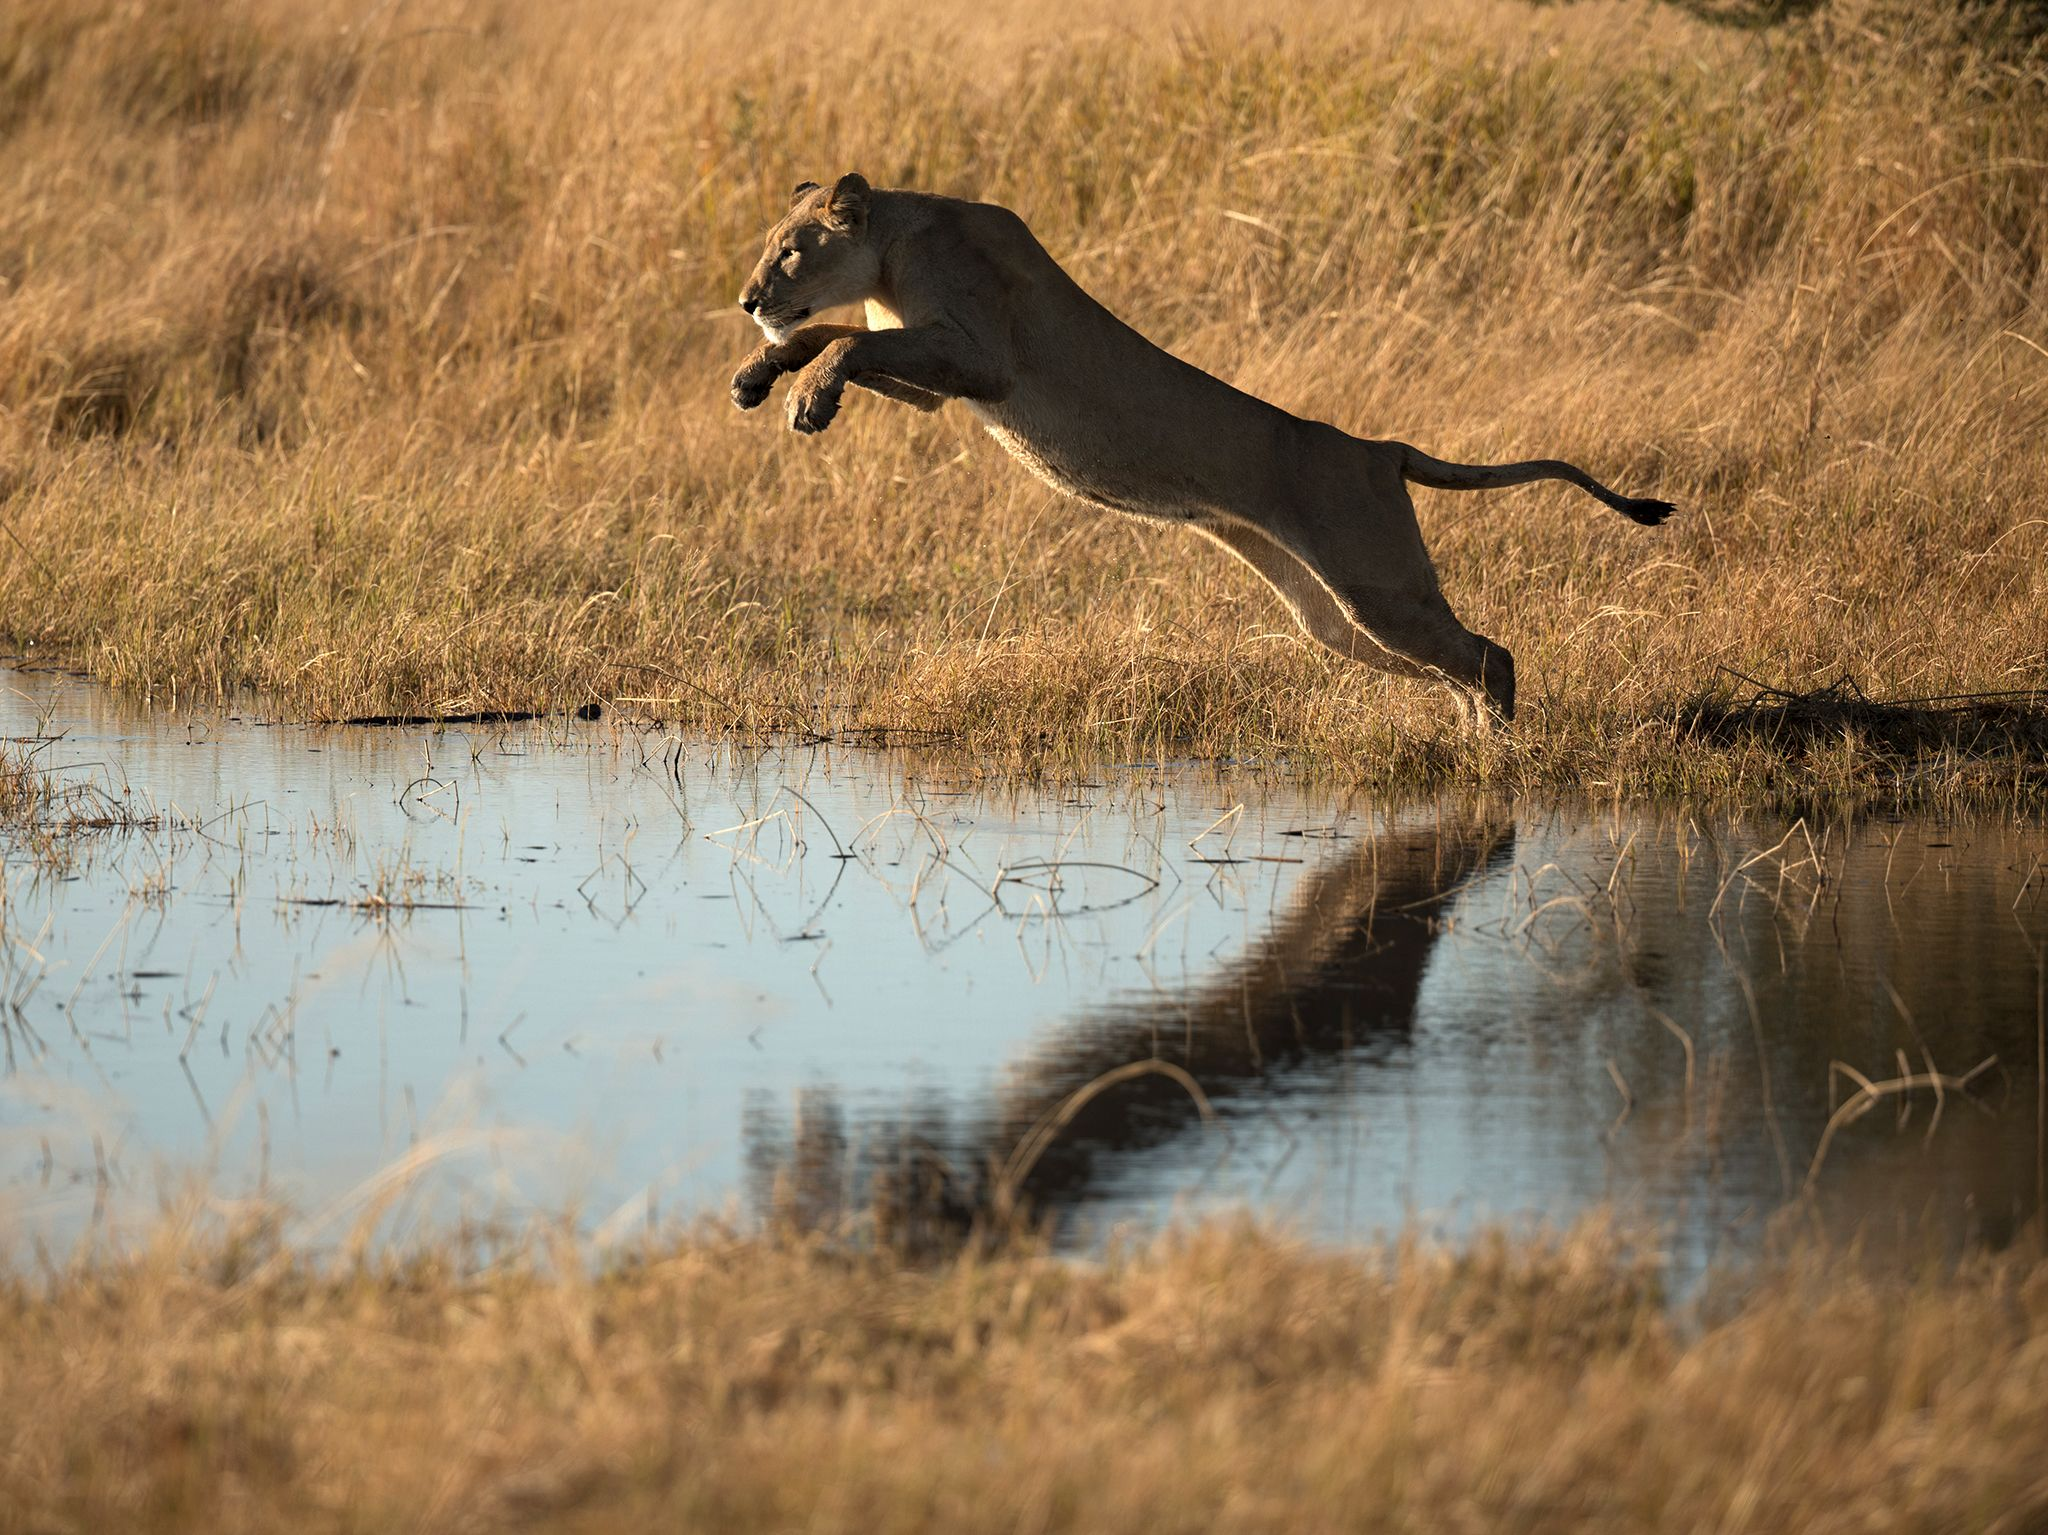 Moremi Game Reserve, Okavango Delta, Botswana:  The deep channels of the Okavango Delta... [Photo of the day - June 2020]